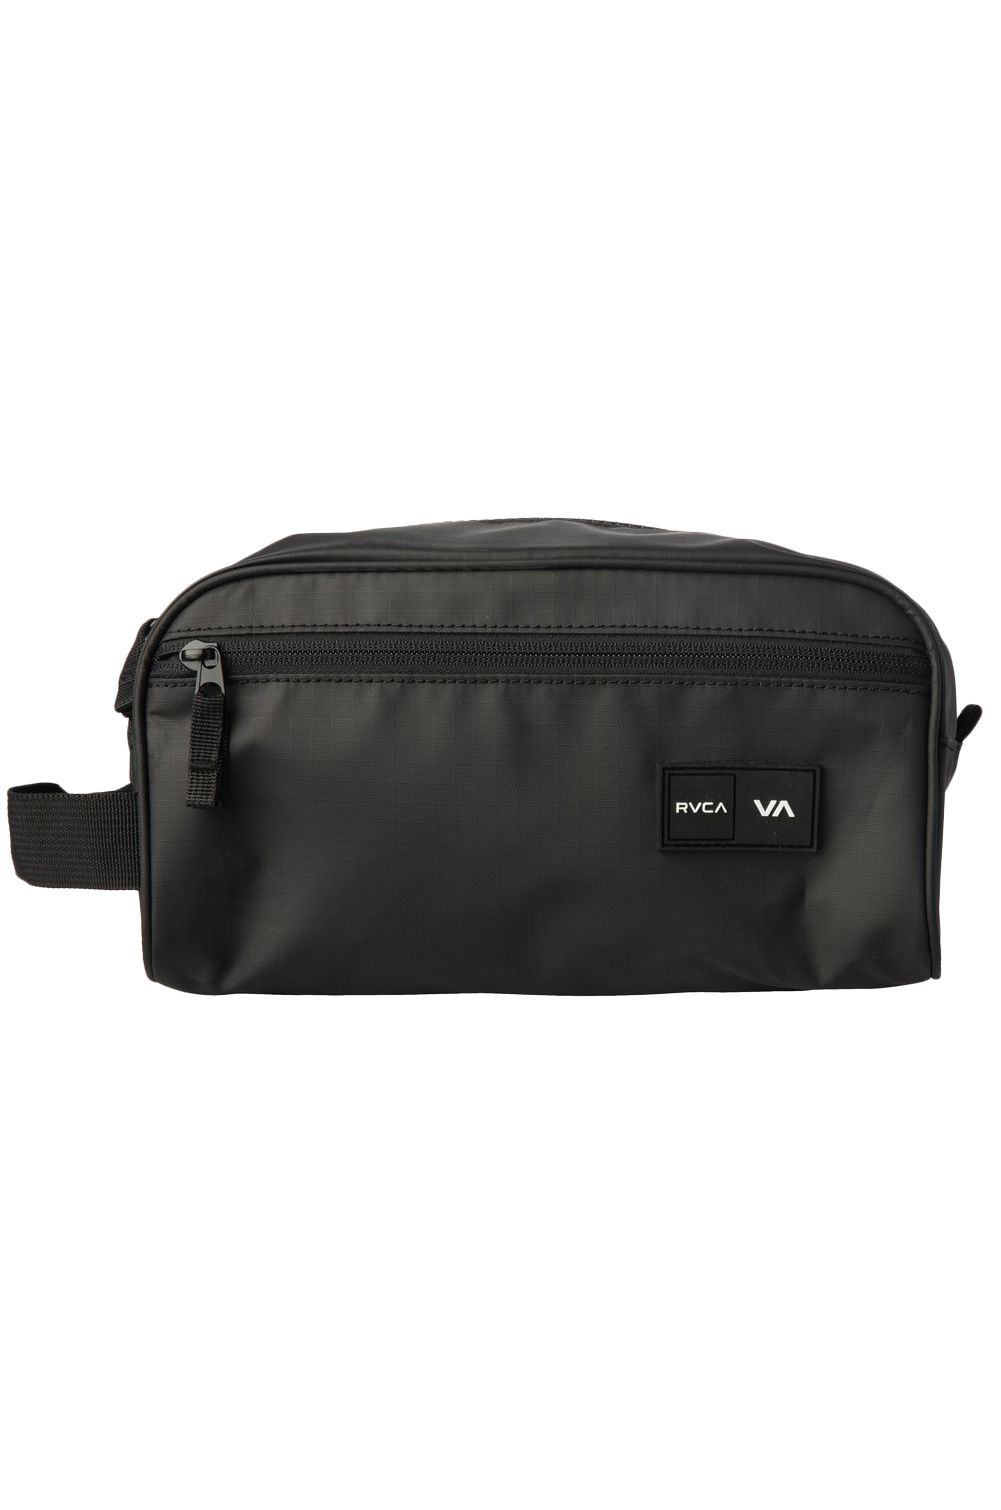 RVCA Travel Kit DOPP KIT Black